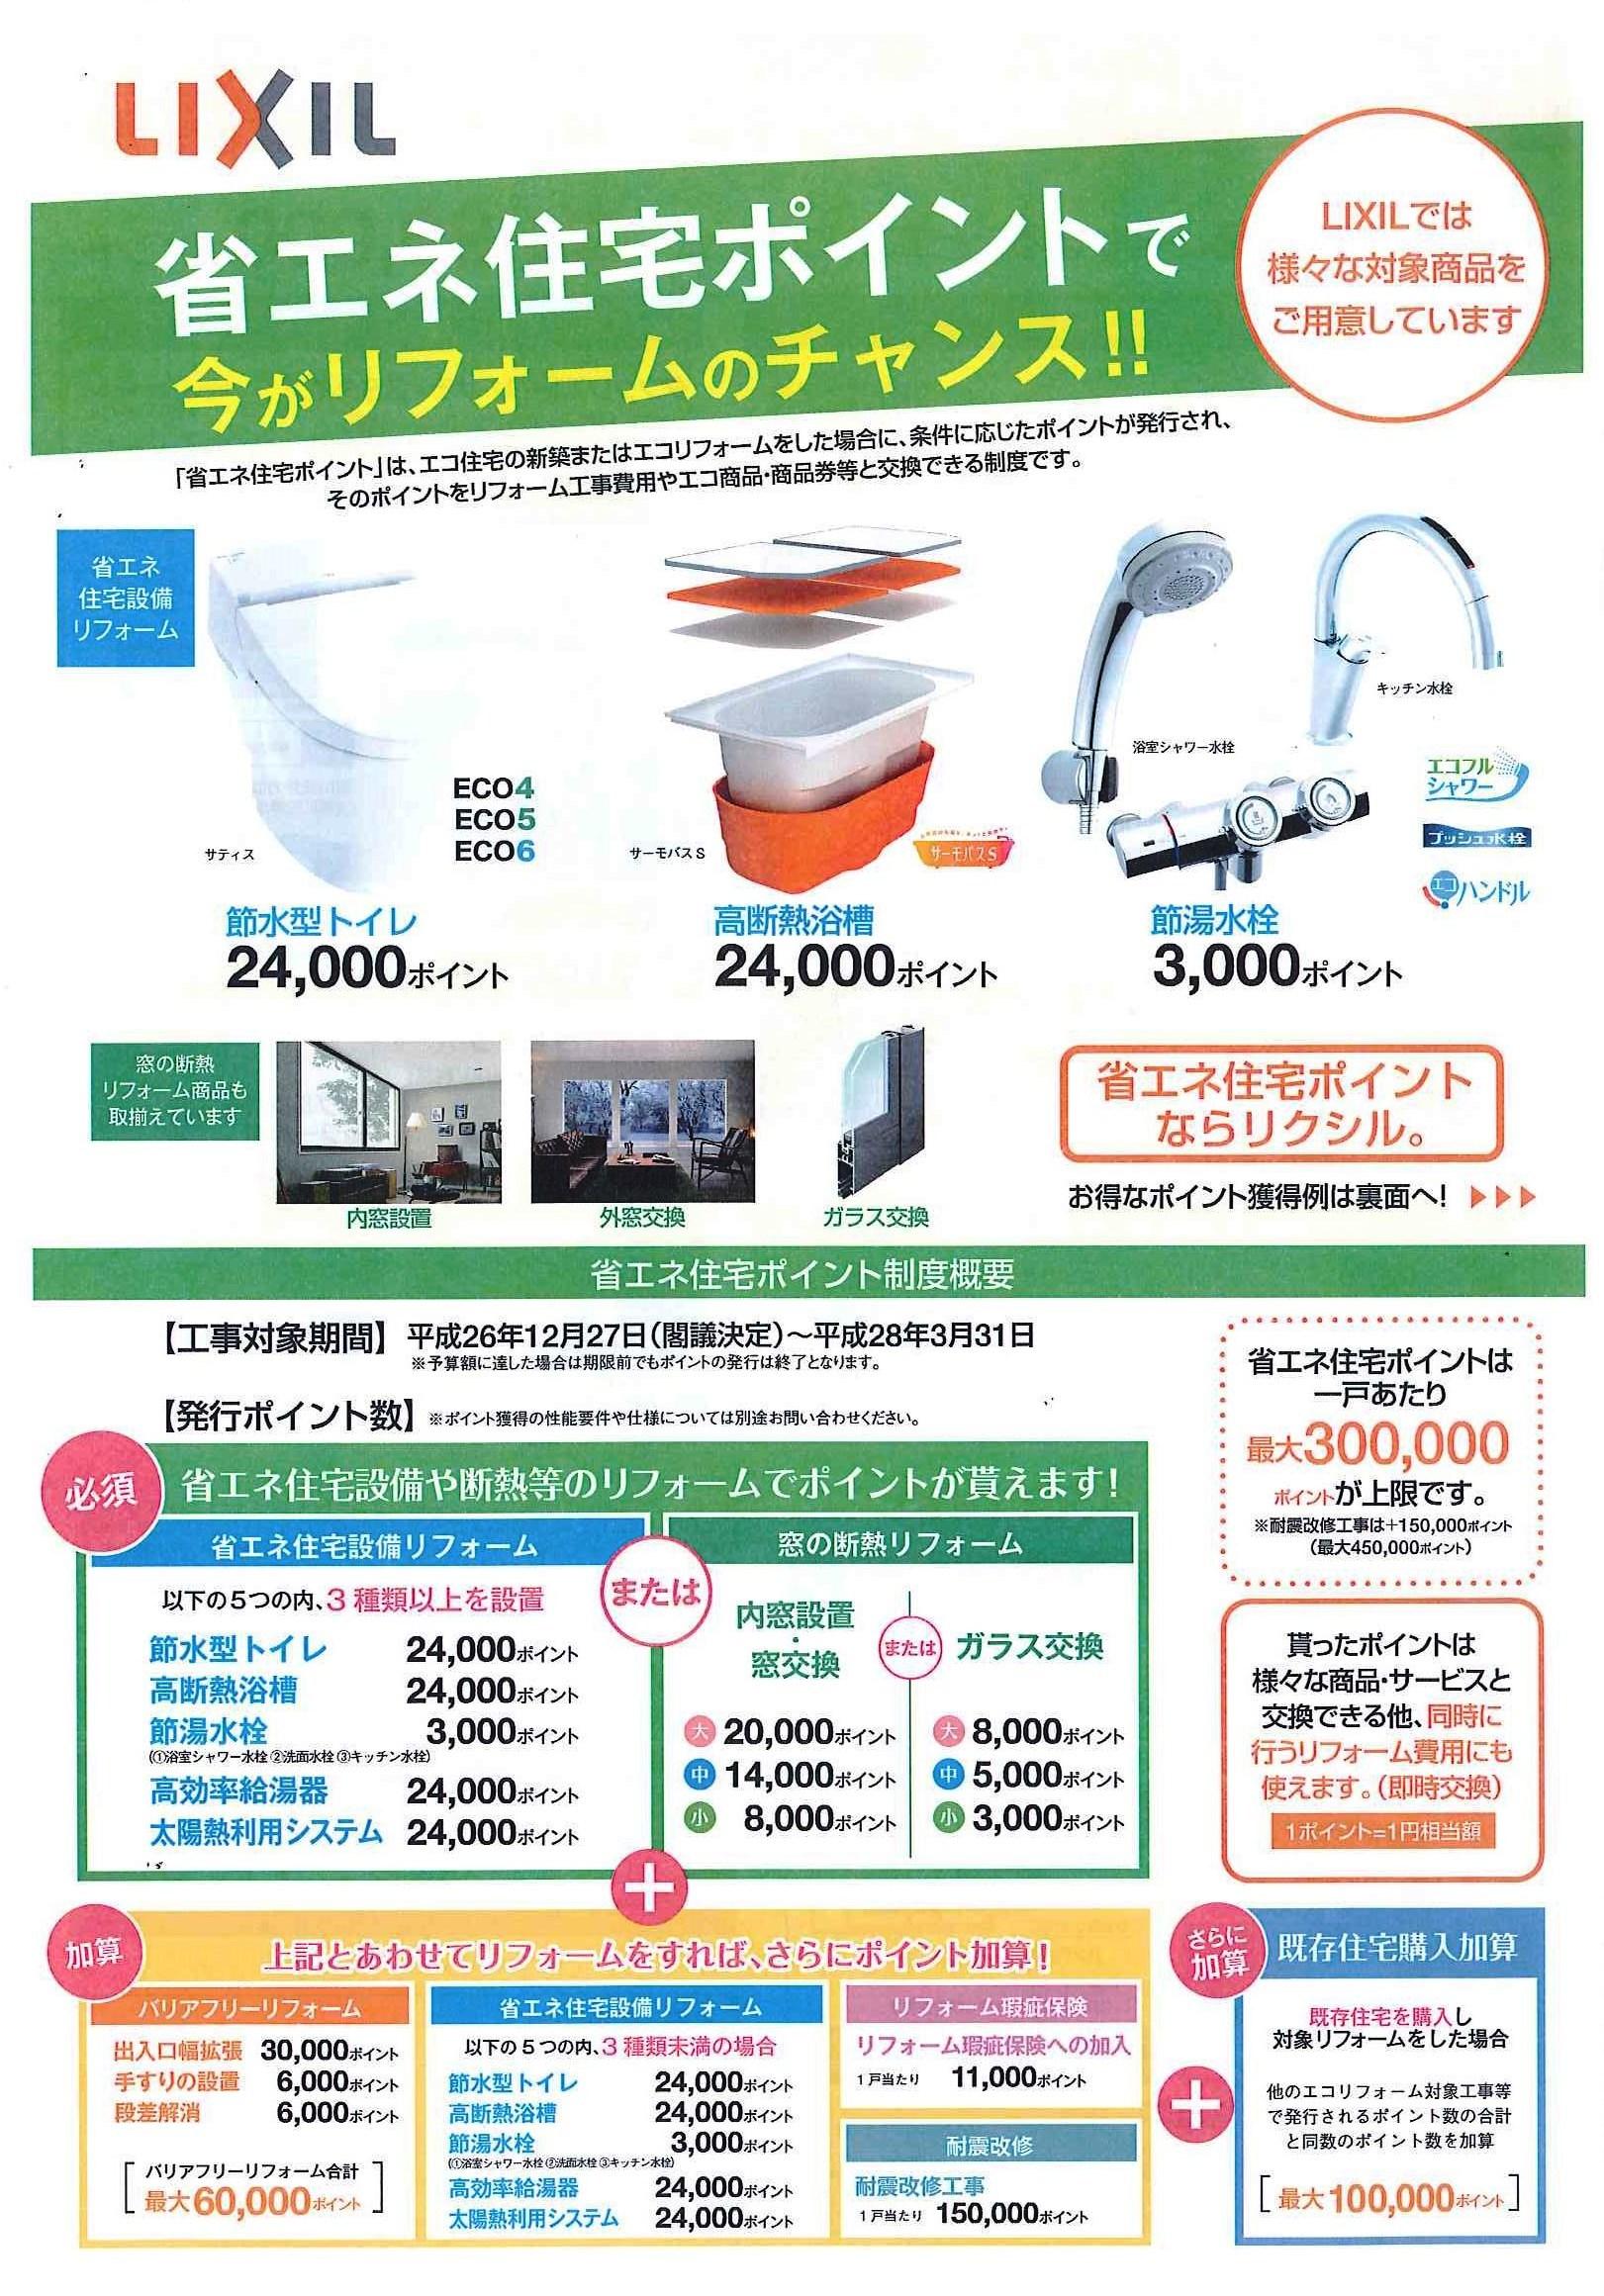 https://lixil-reformshop.jp/shop/SP00000487/20150227132457667_0001.jpg